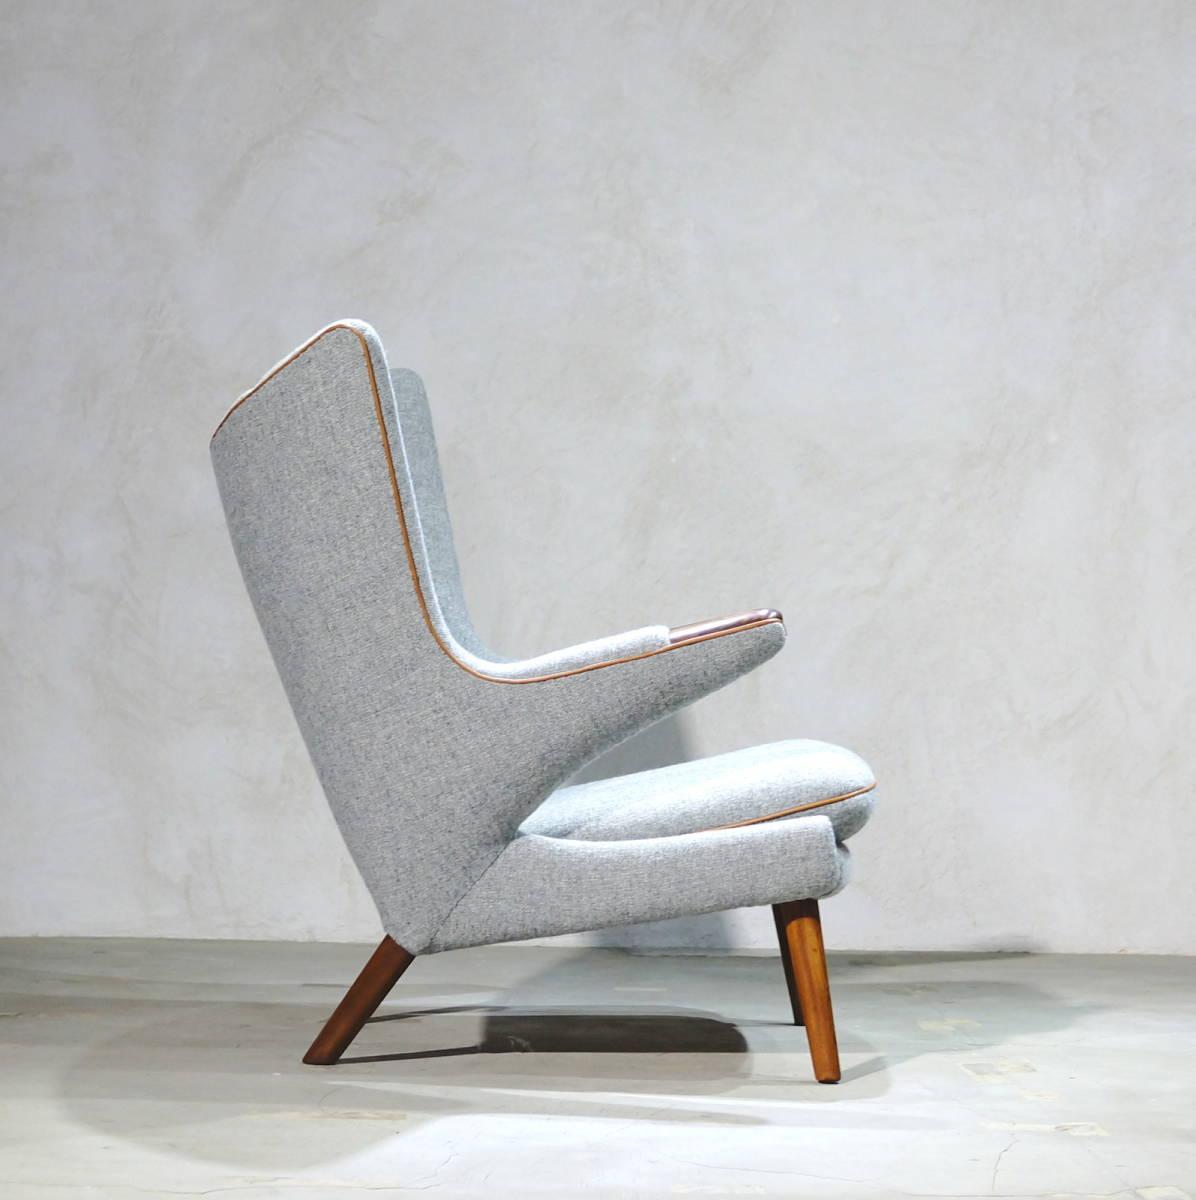 Hans J. Wegner ウェグナー AP-19 Bear Chair ベアチェア Rosewood & Teak ローズウッド&チーク ※フィンユール モーエンセン_画像5